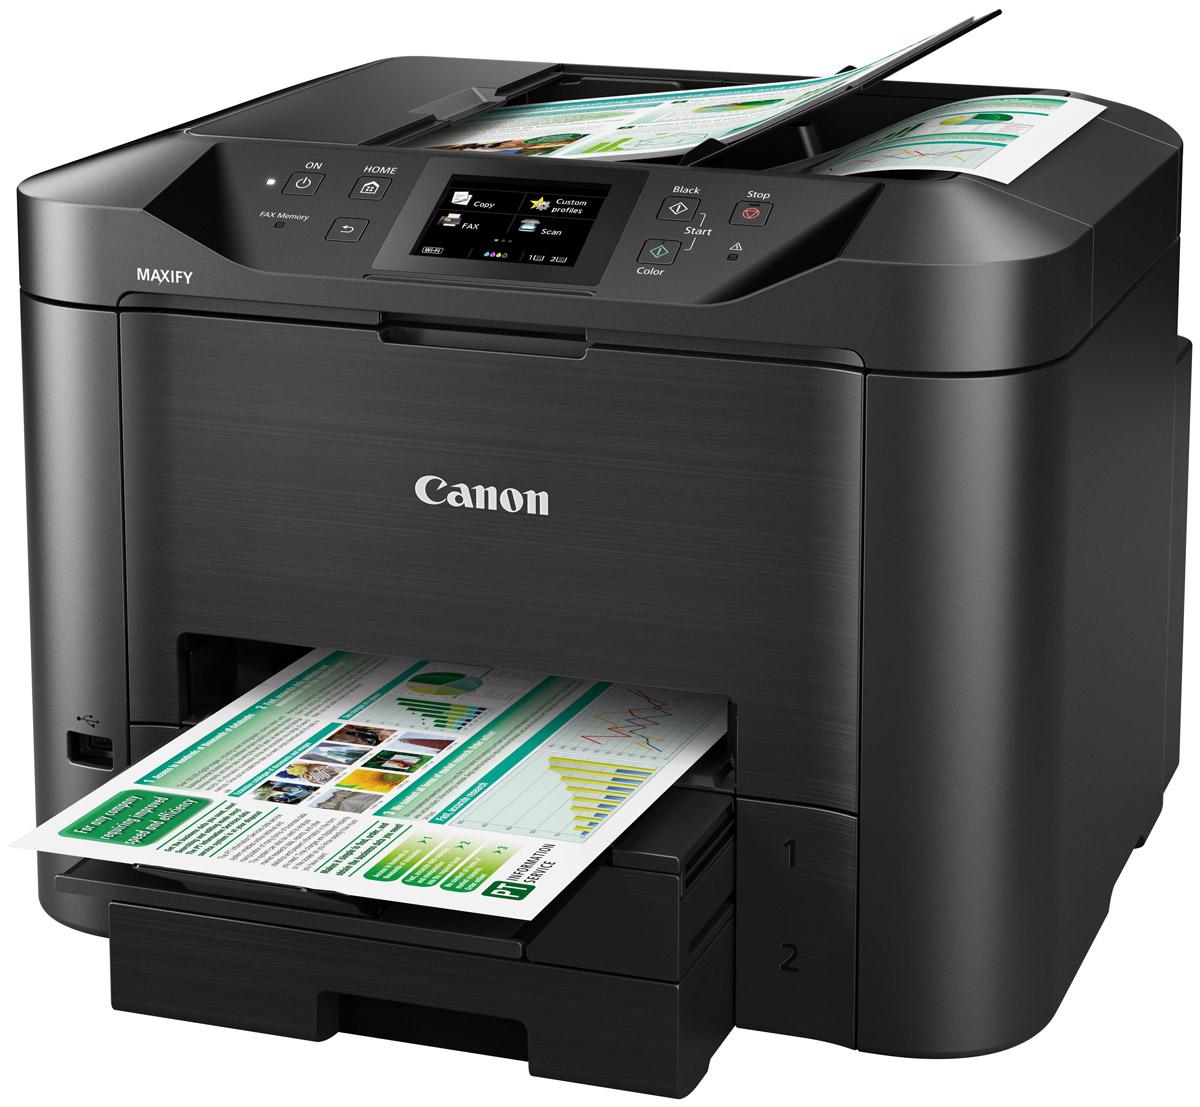 Canon Maxify MB5440 (0971C007) МФУ